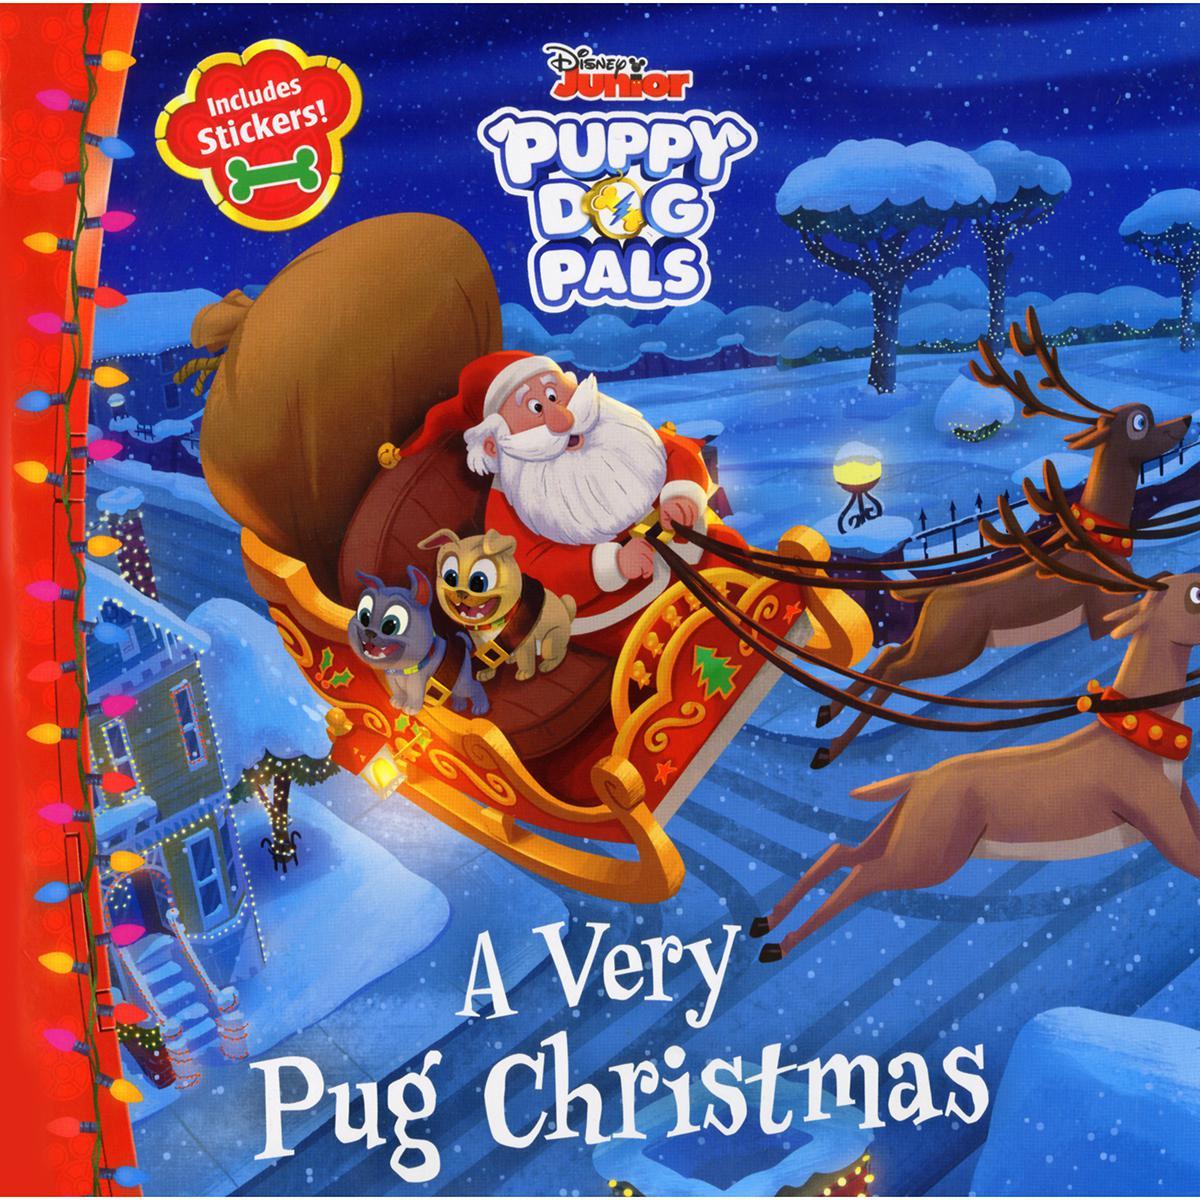 Puppy Dog Pals: A Very Pug Christmas